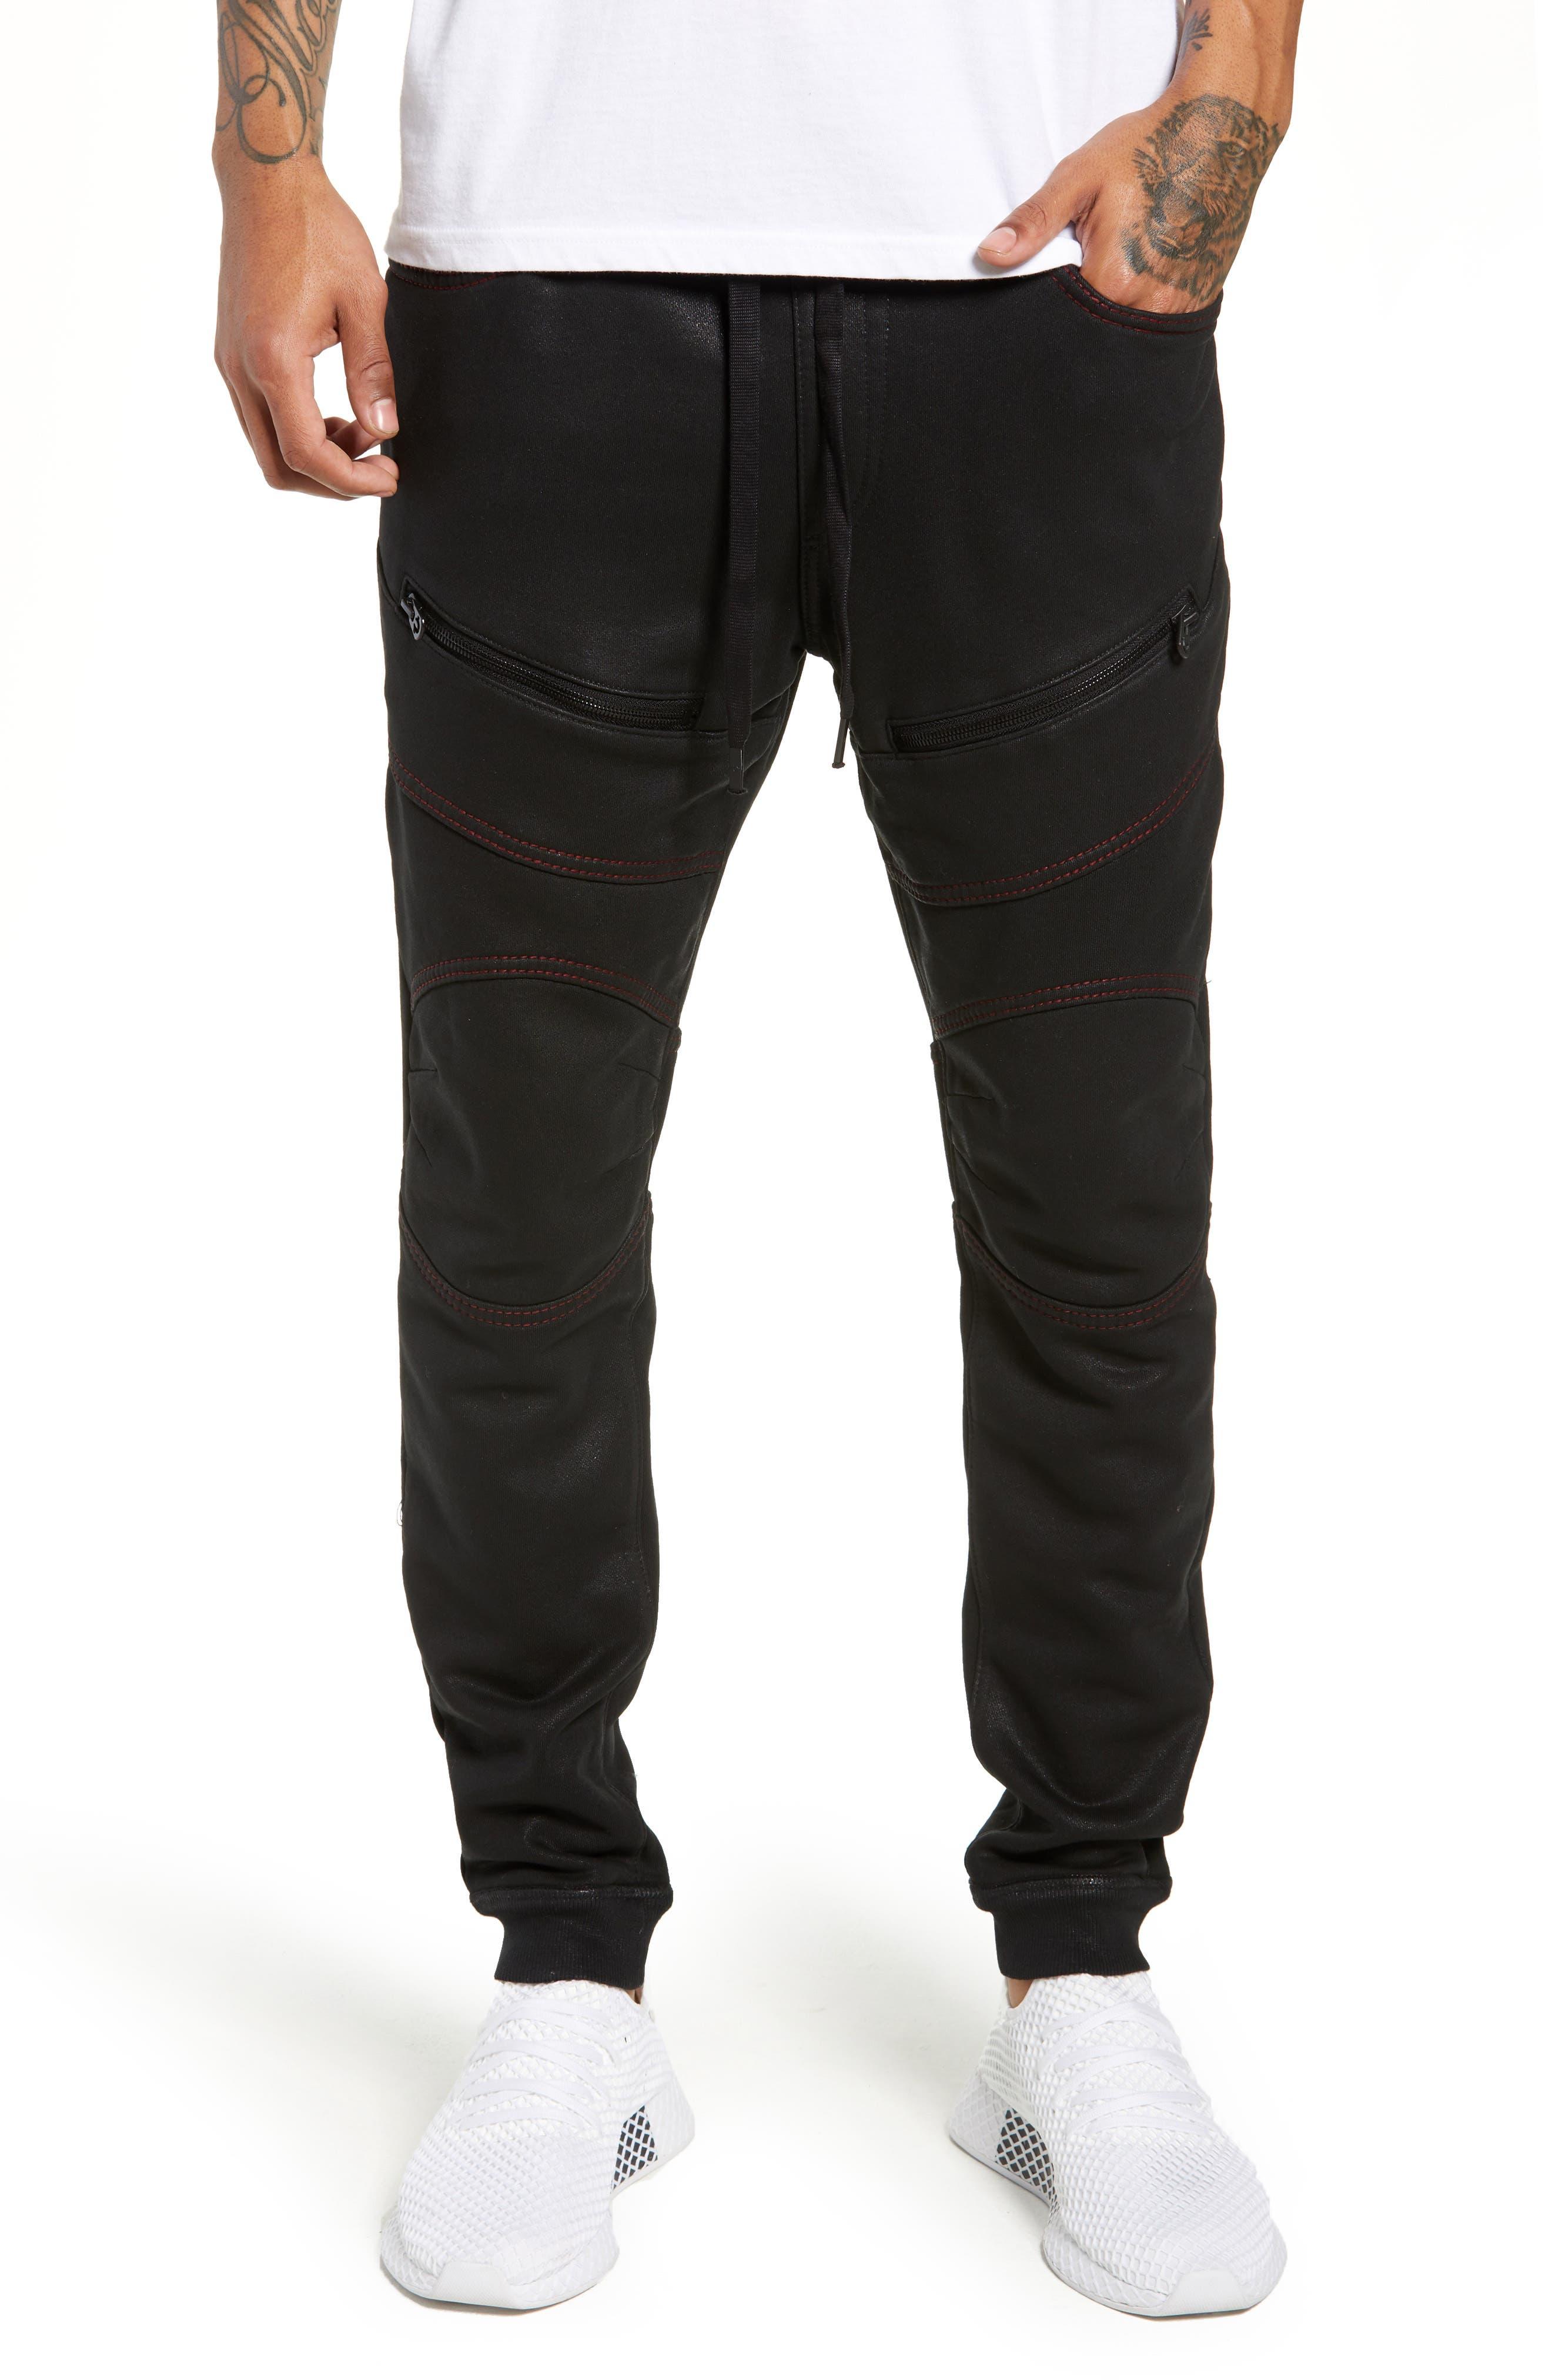 Moto Active Sweatpants,                             Main thumbnail 1, color,                             TRUE BLACK